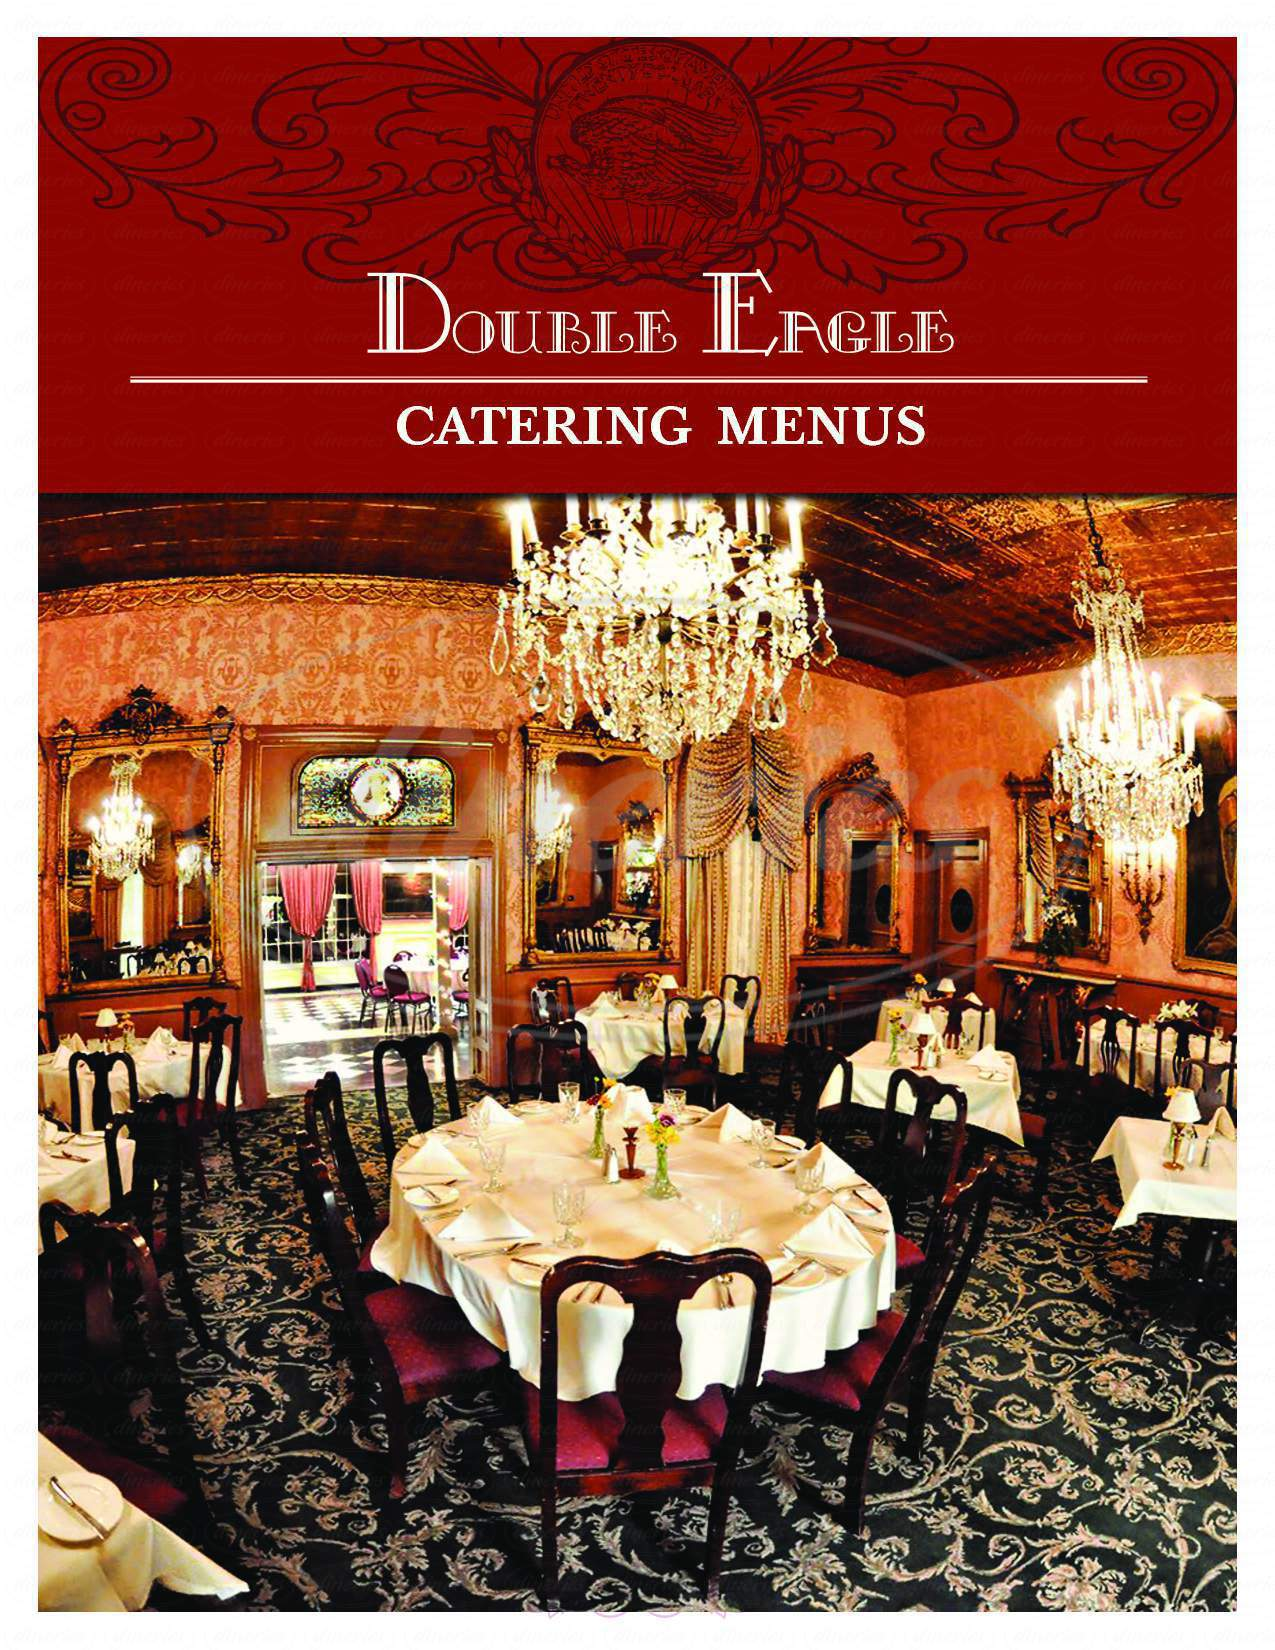 menu for Double Eagle